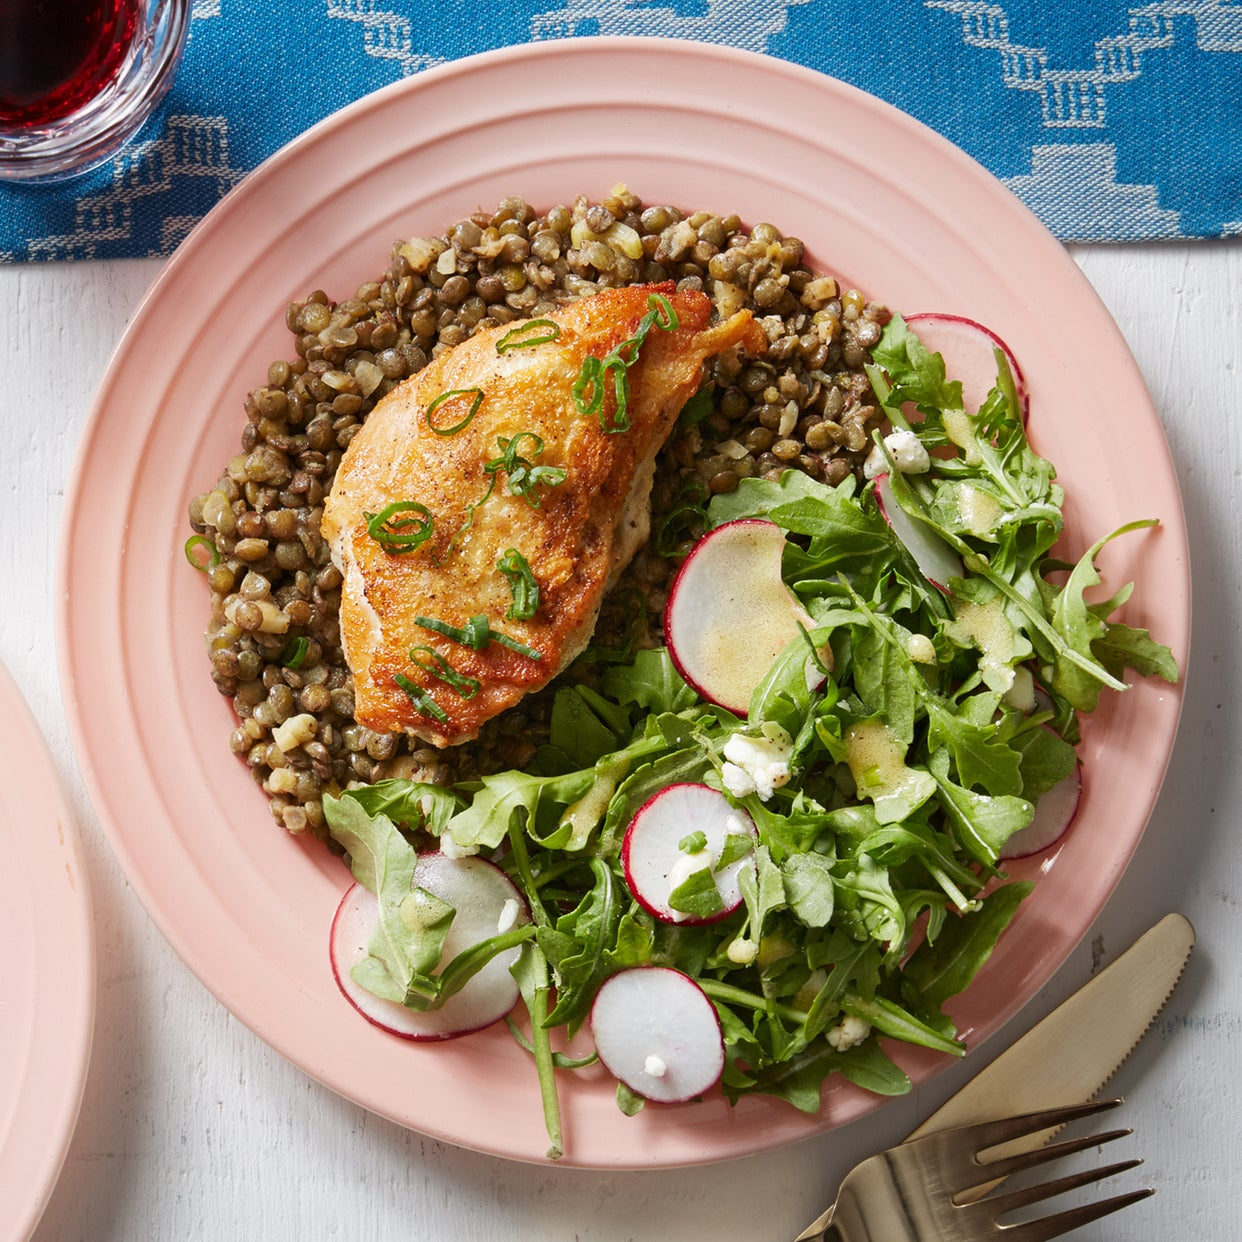 Seared Chicken & French Lentils with Arugula & Feta Salad